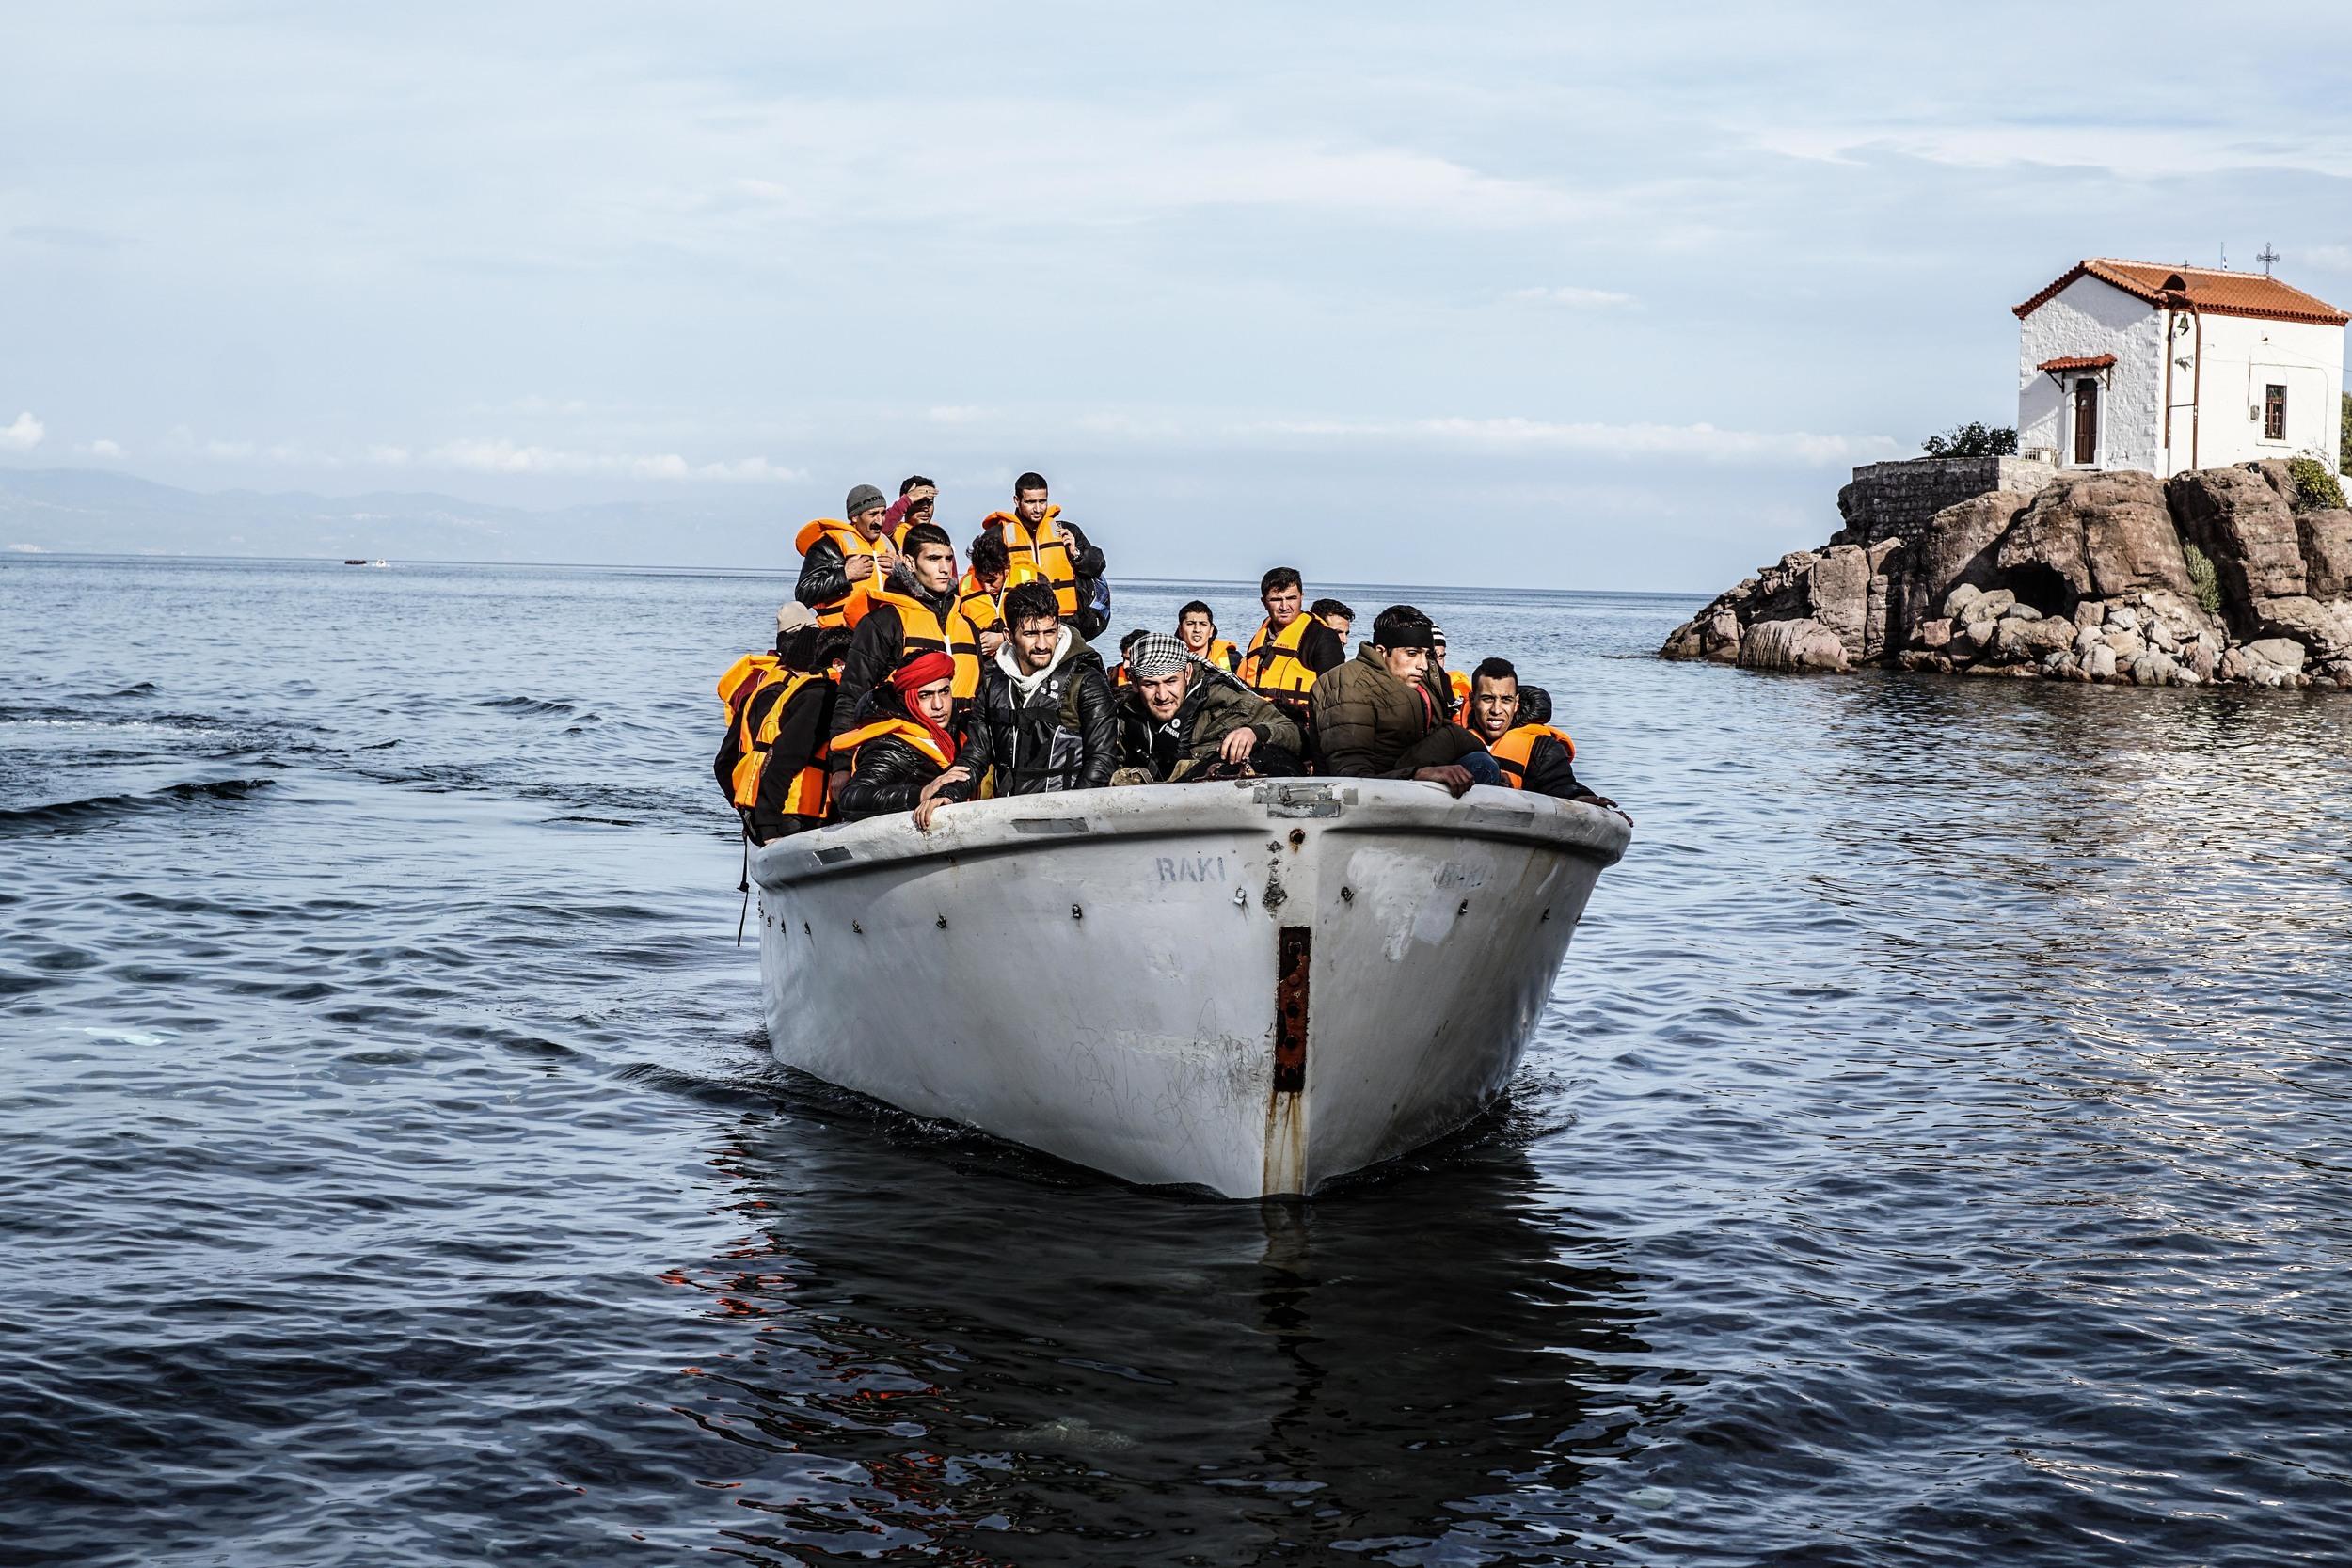 Syrian Refugee Crisis Lesbos Greece November 2015 30.jpg